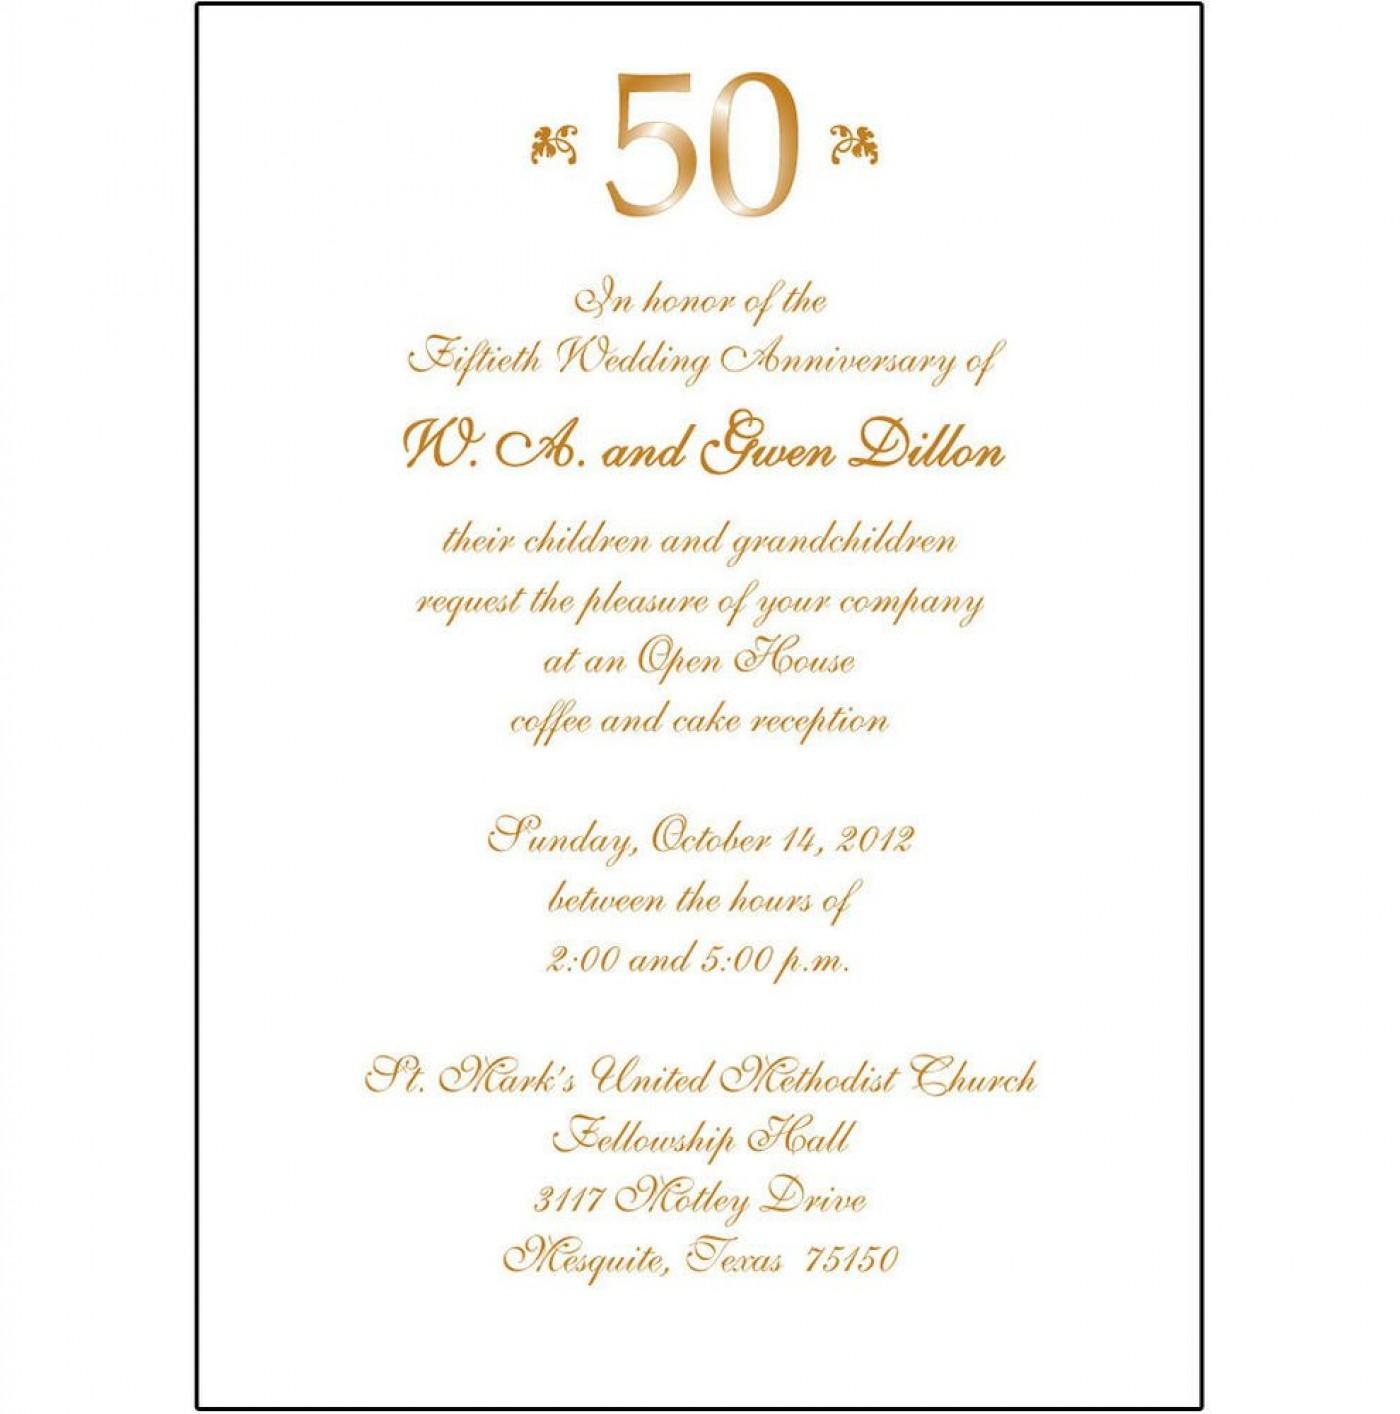 008 Fantastic 50th Anniversary Invitation Wording Sample Inspiration  Wedding 60th In Tamil Birthday1400